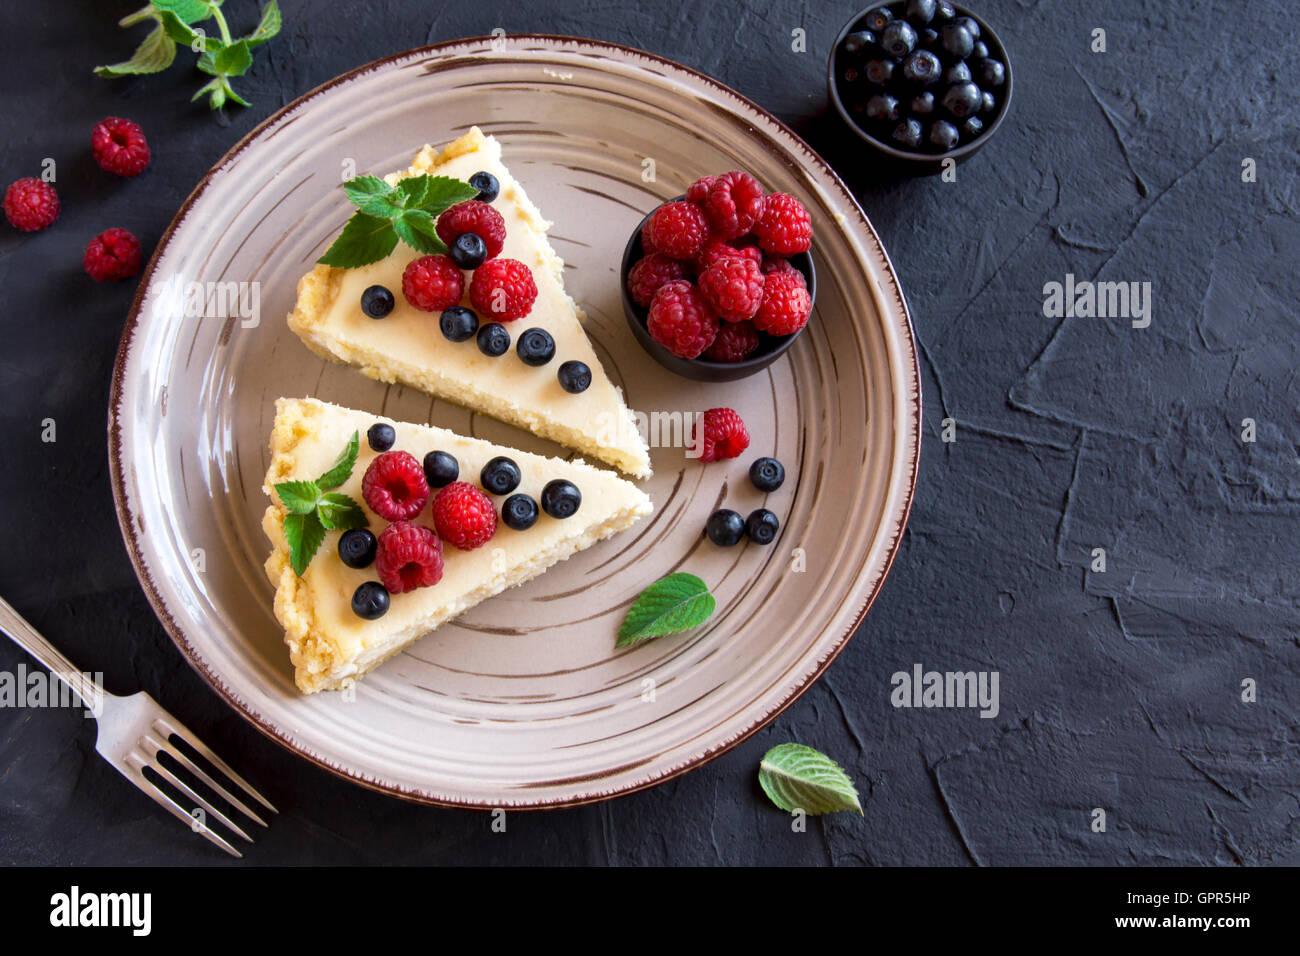 Tarta de queso casera con bayas frescas y menta para postre Imagen De Stock